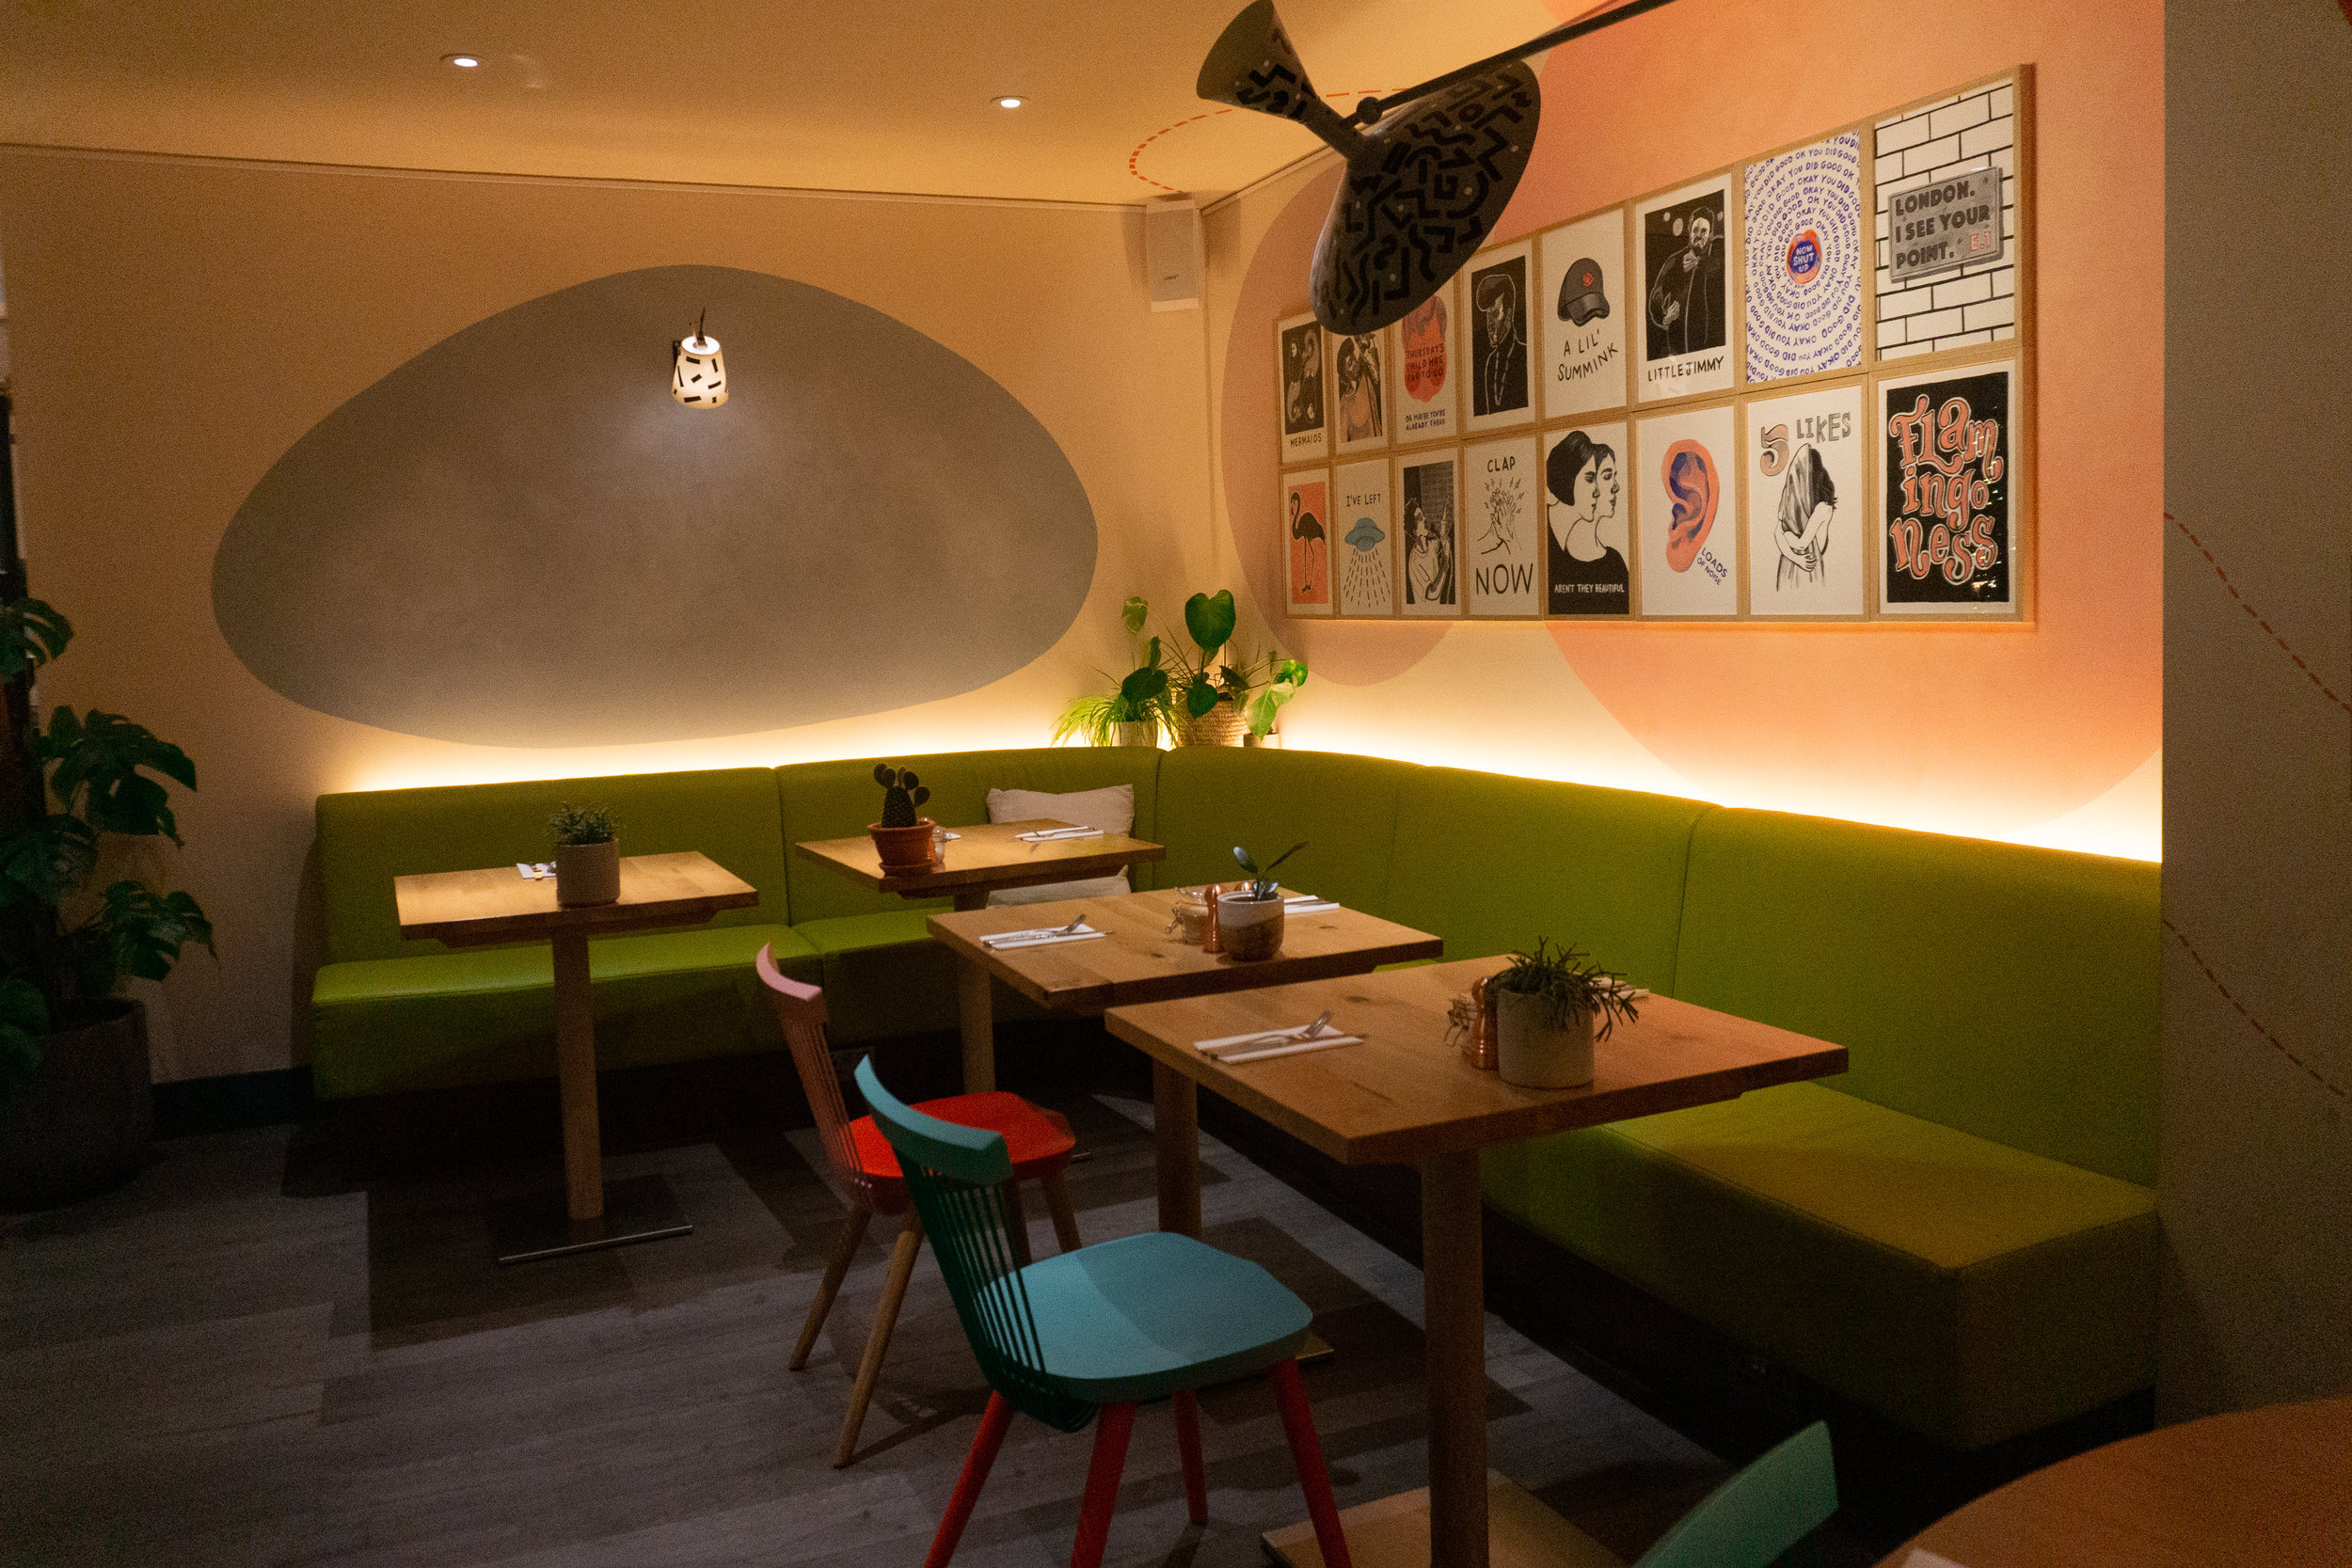 London's Greenest Hotel - Qbic Hotel | HallAroundtheWorld